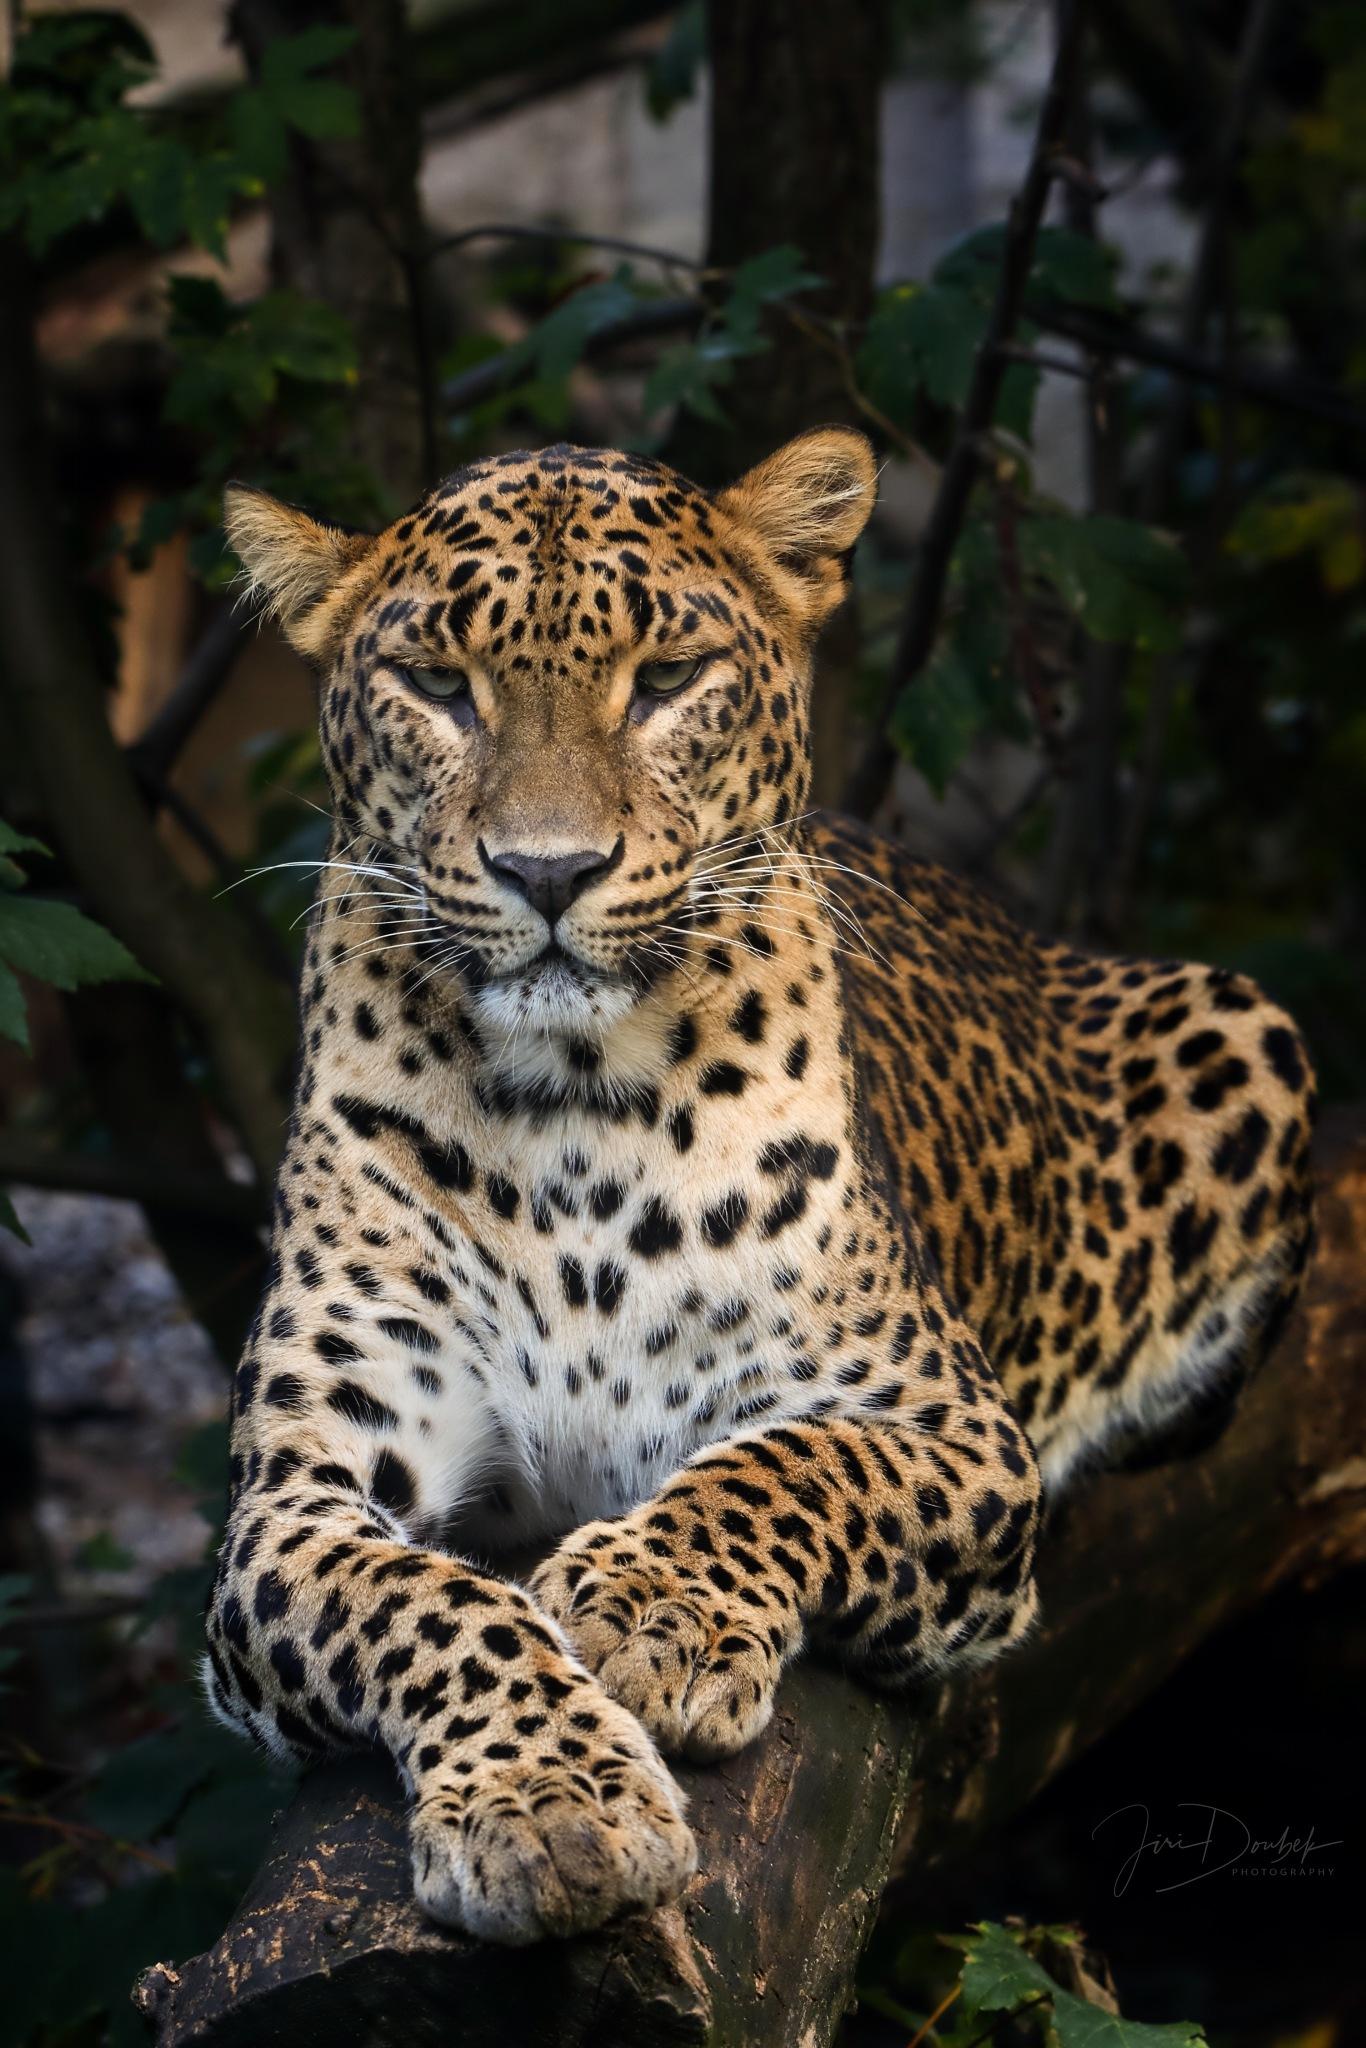 Sri Lankan leopard by Jiri Doubek